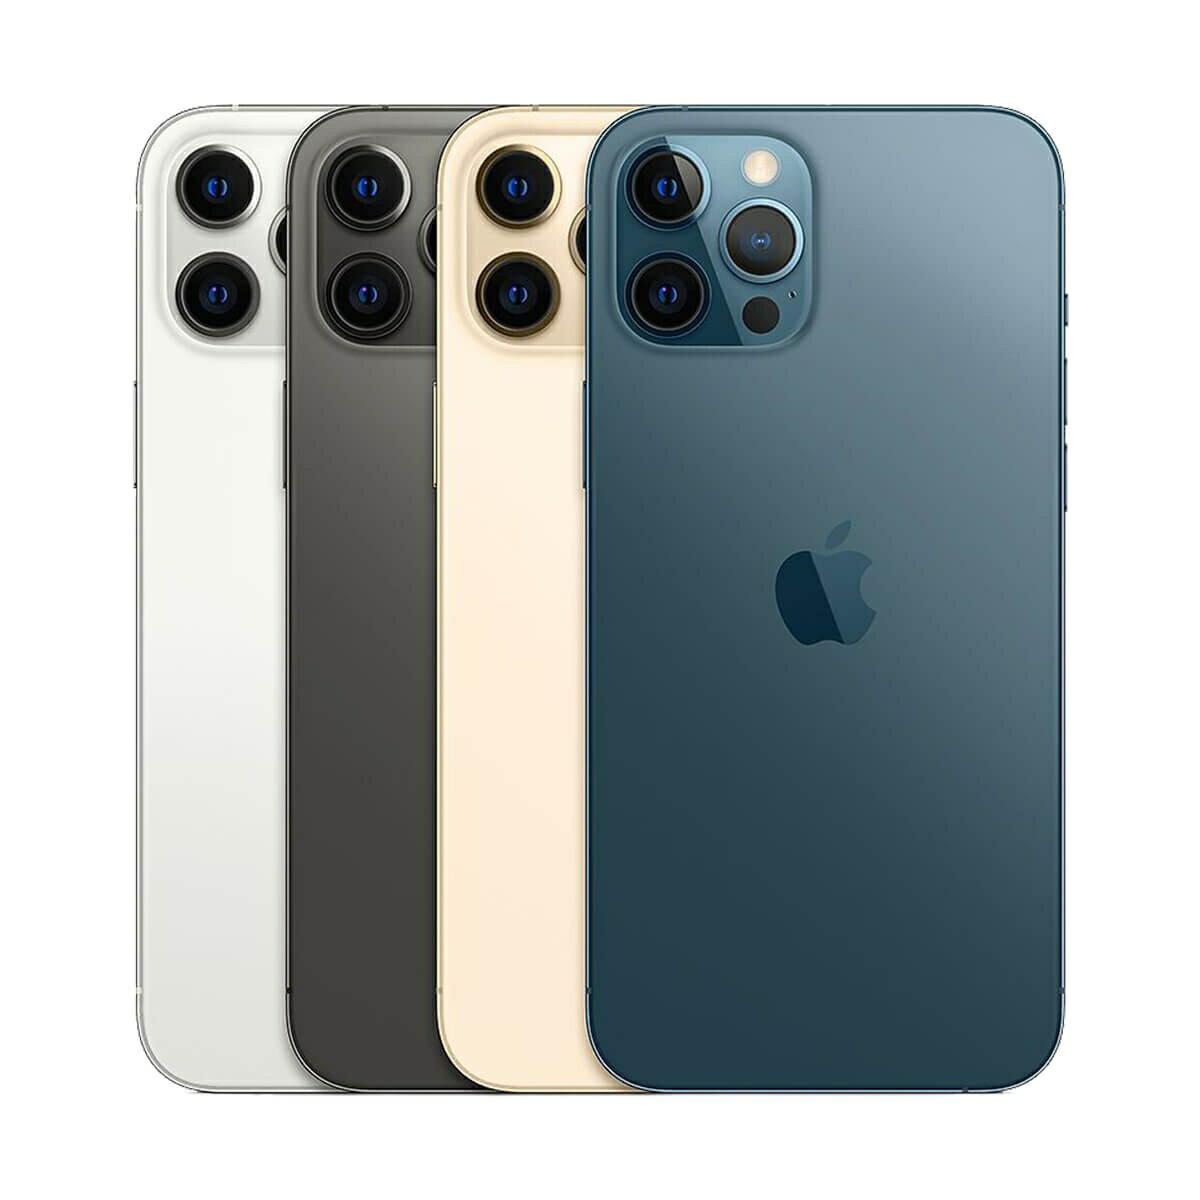 IPhone 12 Pro Max 256GB 全新未拆封 台灣公司貨 原廠保固一年